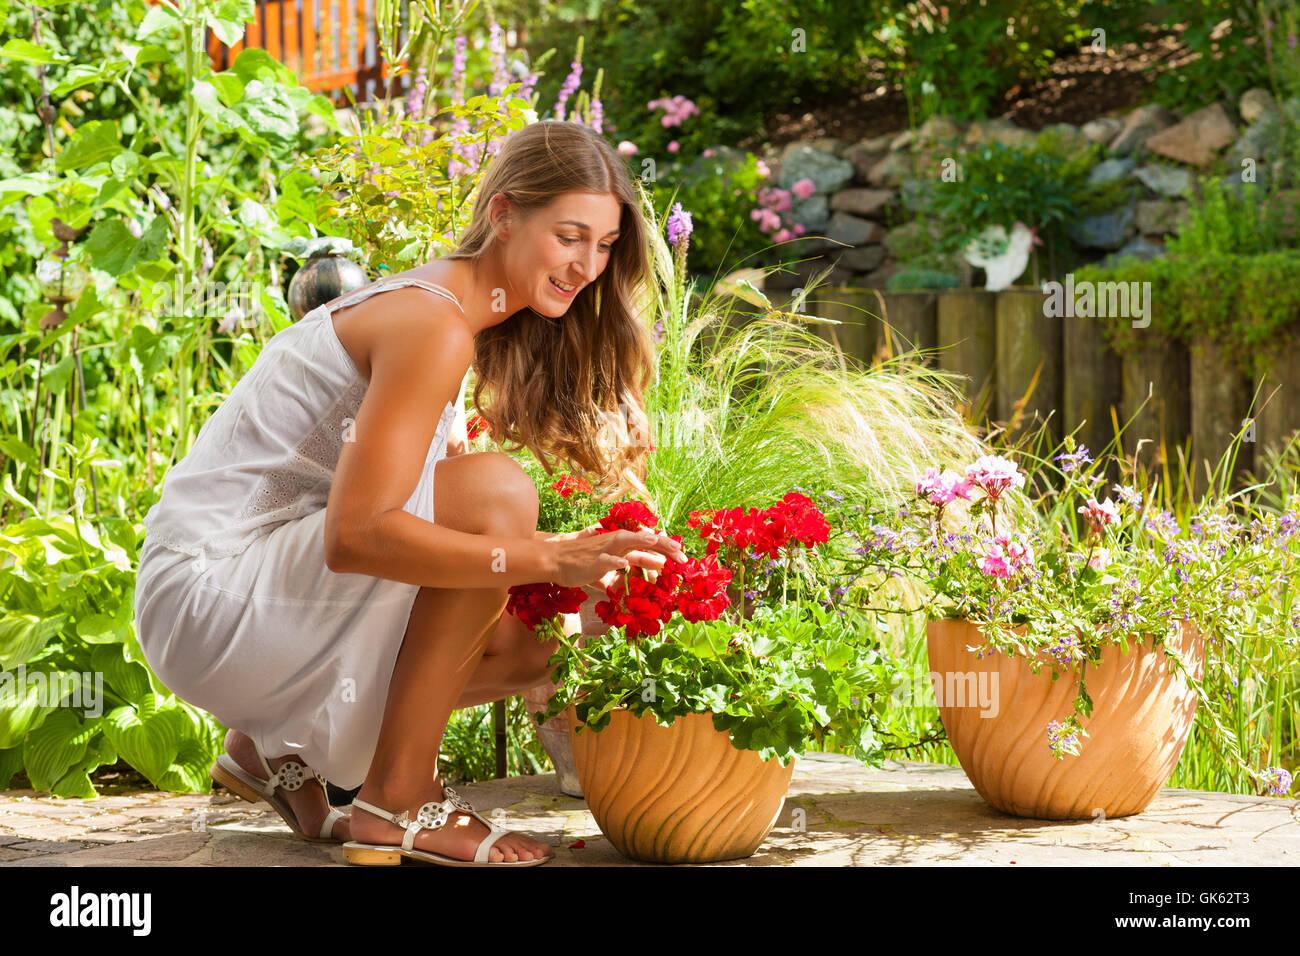 6f80566aa Mujer jardín de flores Foto & Imagen De Stock: 115074627 - Alamy